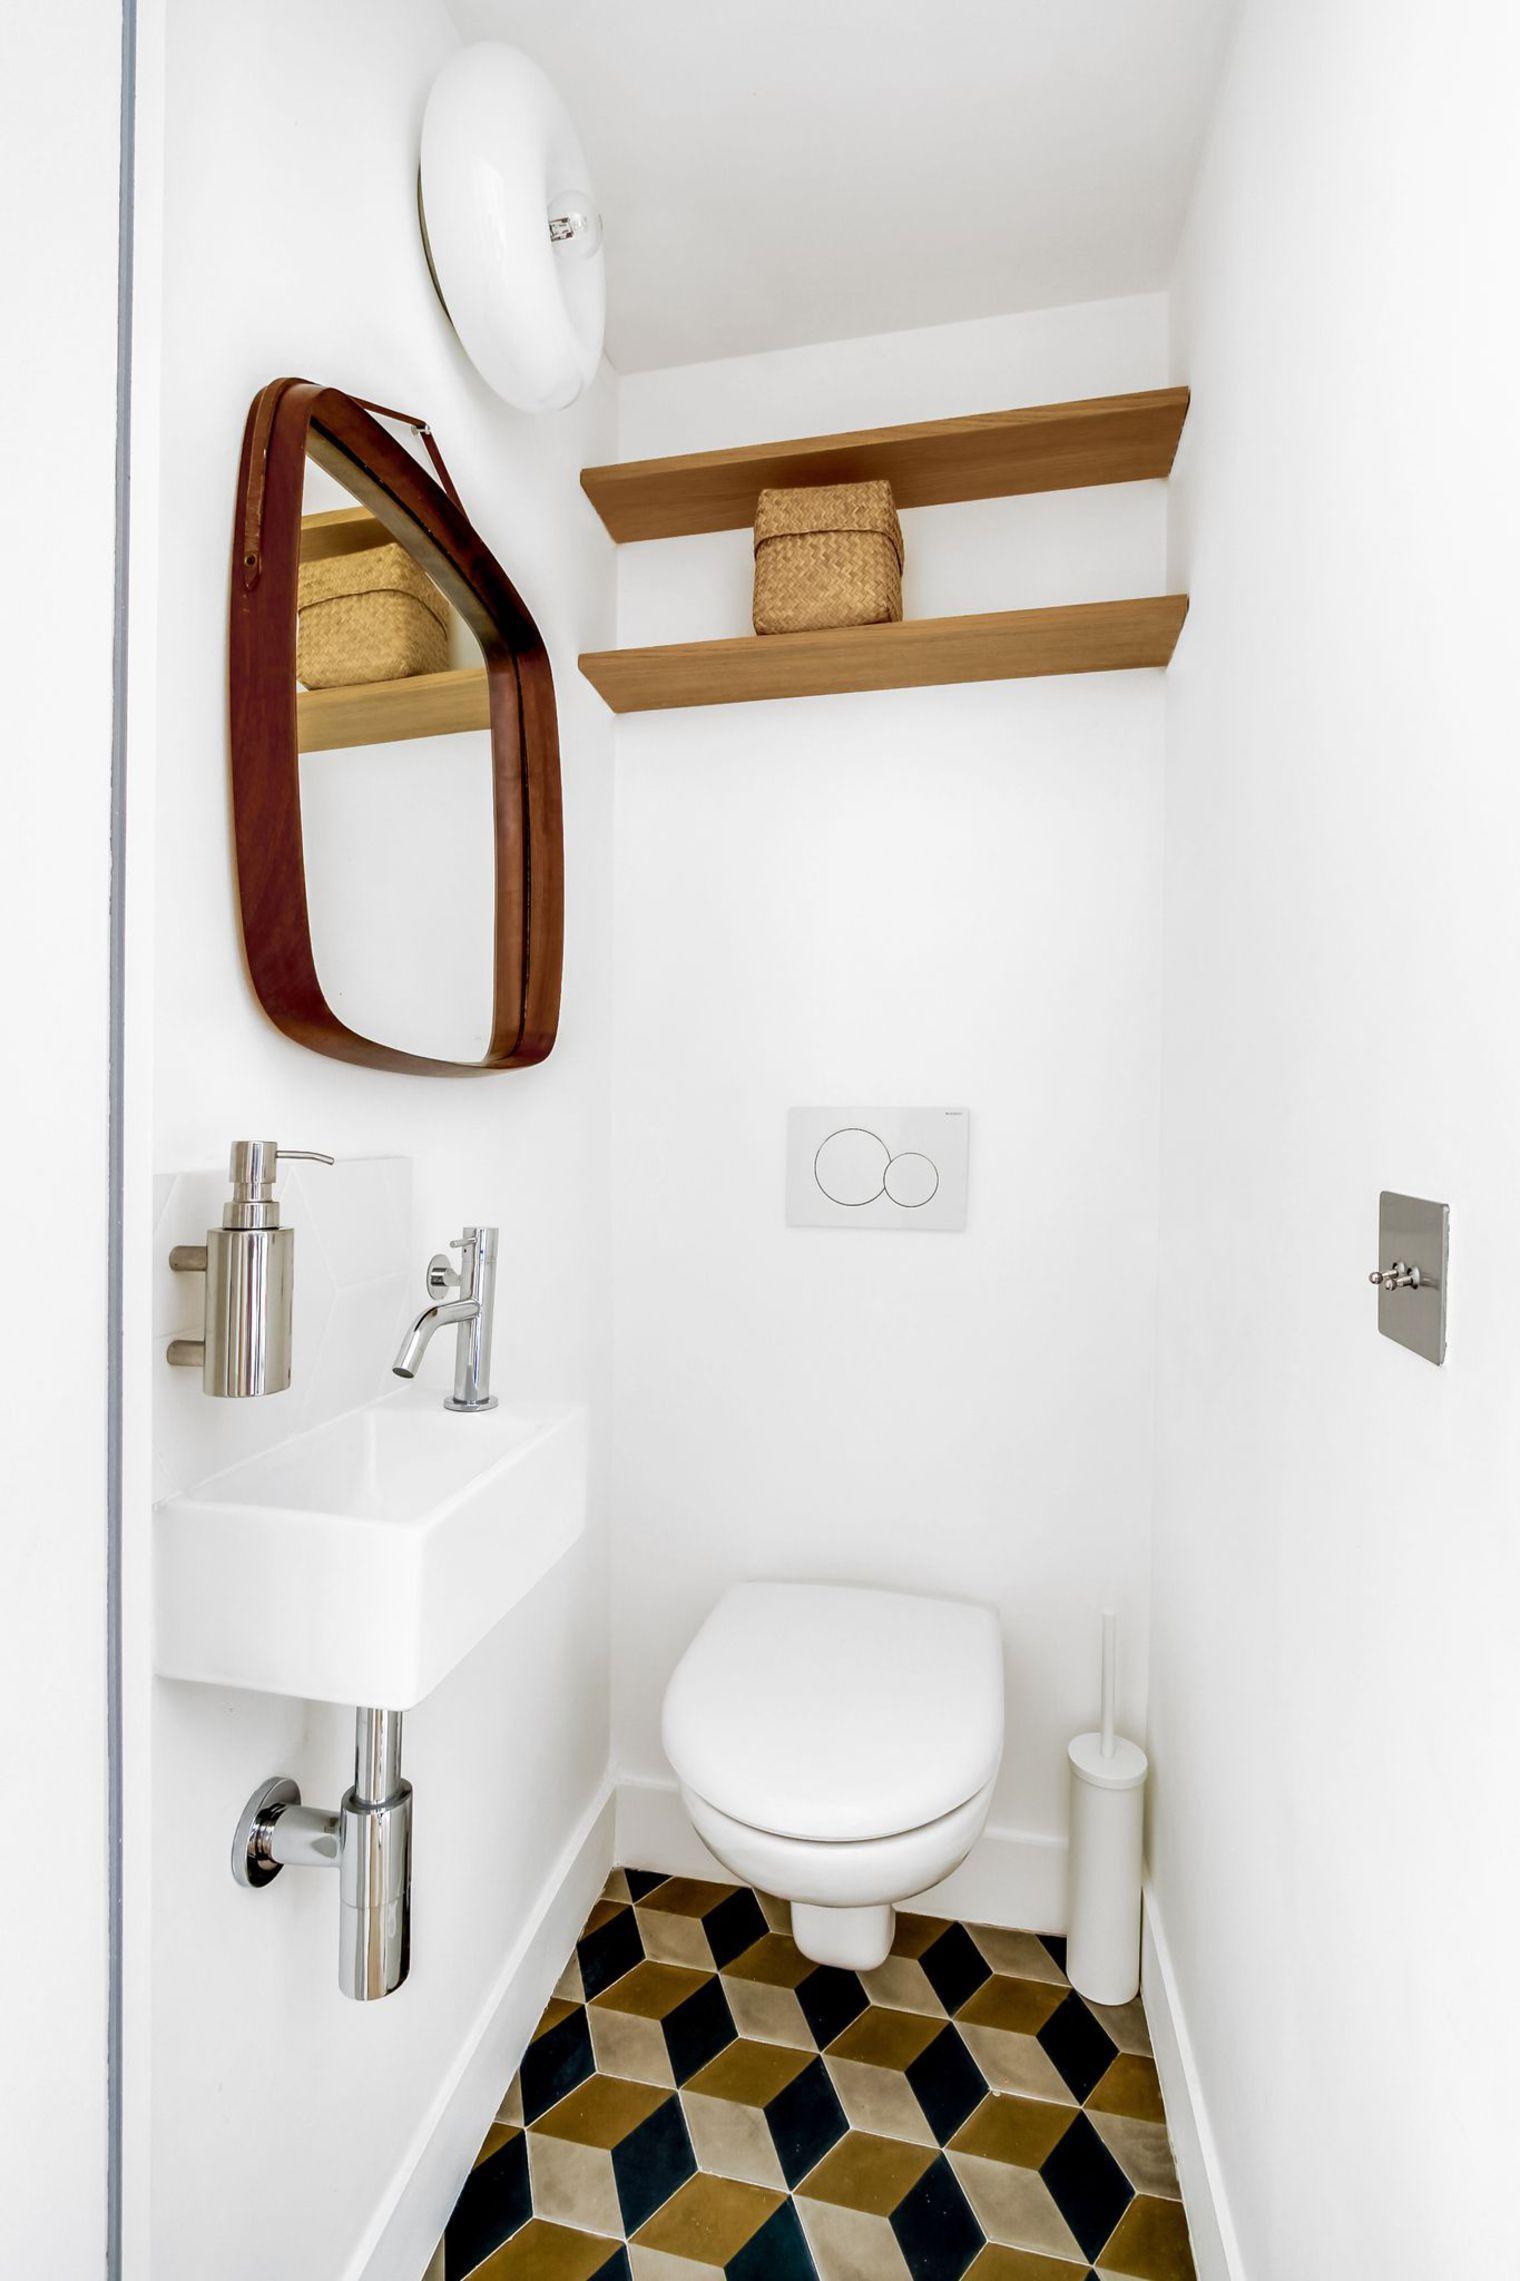 En vidéo : mélange de styles dans ce 36 m2 | Toilet, Retro vintage on bathroom tile ideas, bathroom cabinet designs, bathroom makeover for small bathrooms, bathroom themes, bathroom design ideas, bathroom decor, bathroom decorating, bathroom cabinets for small bathrooms, hgtv small bathrooms, bathroom trends, bathroom shower designs, bathroom shower ideas for small bathrooms, bathroom designs for small spaces, interior designs for small bathrooms, bathroom color ideas, bathroom color designs, terrace designs for small bathrooms, bathroom remodeling, tile designs for bathrooms, bathroom layouts,